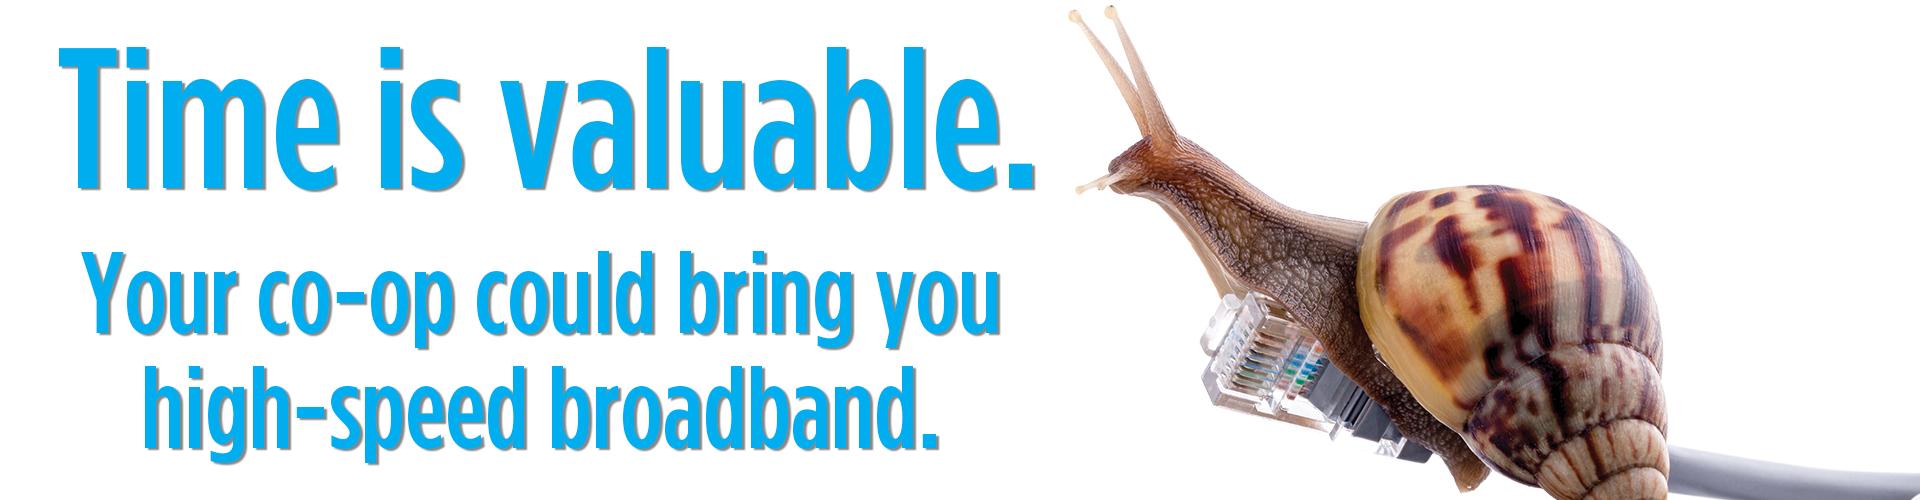 https://united-cs.com/sites/united-cs/files/revslider/image/Broadband3_0.jpg